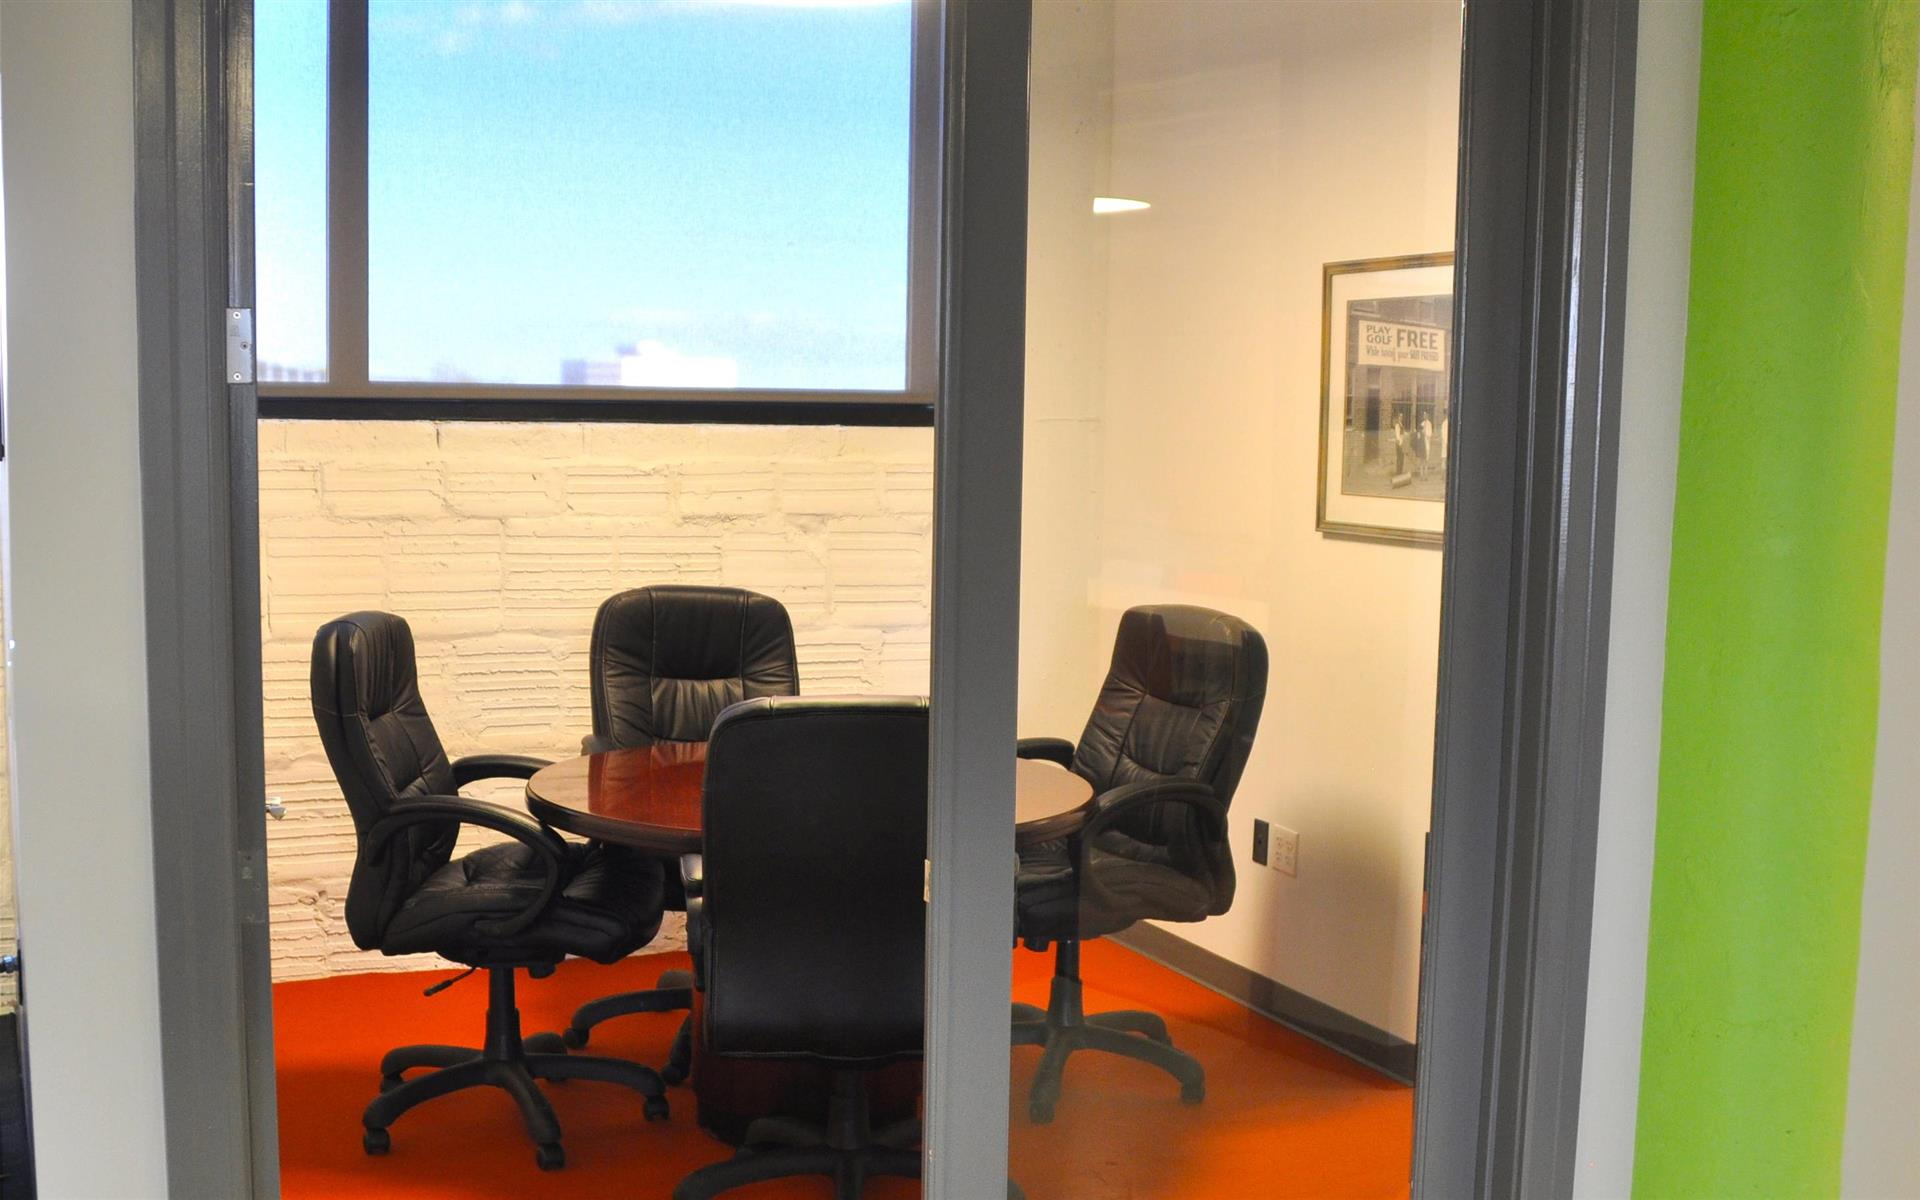 COMRADITY Strategy & Creative Resource Center - Mini Board Room